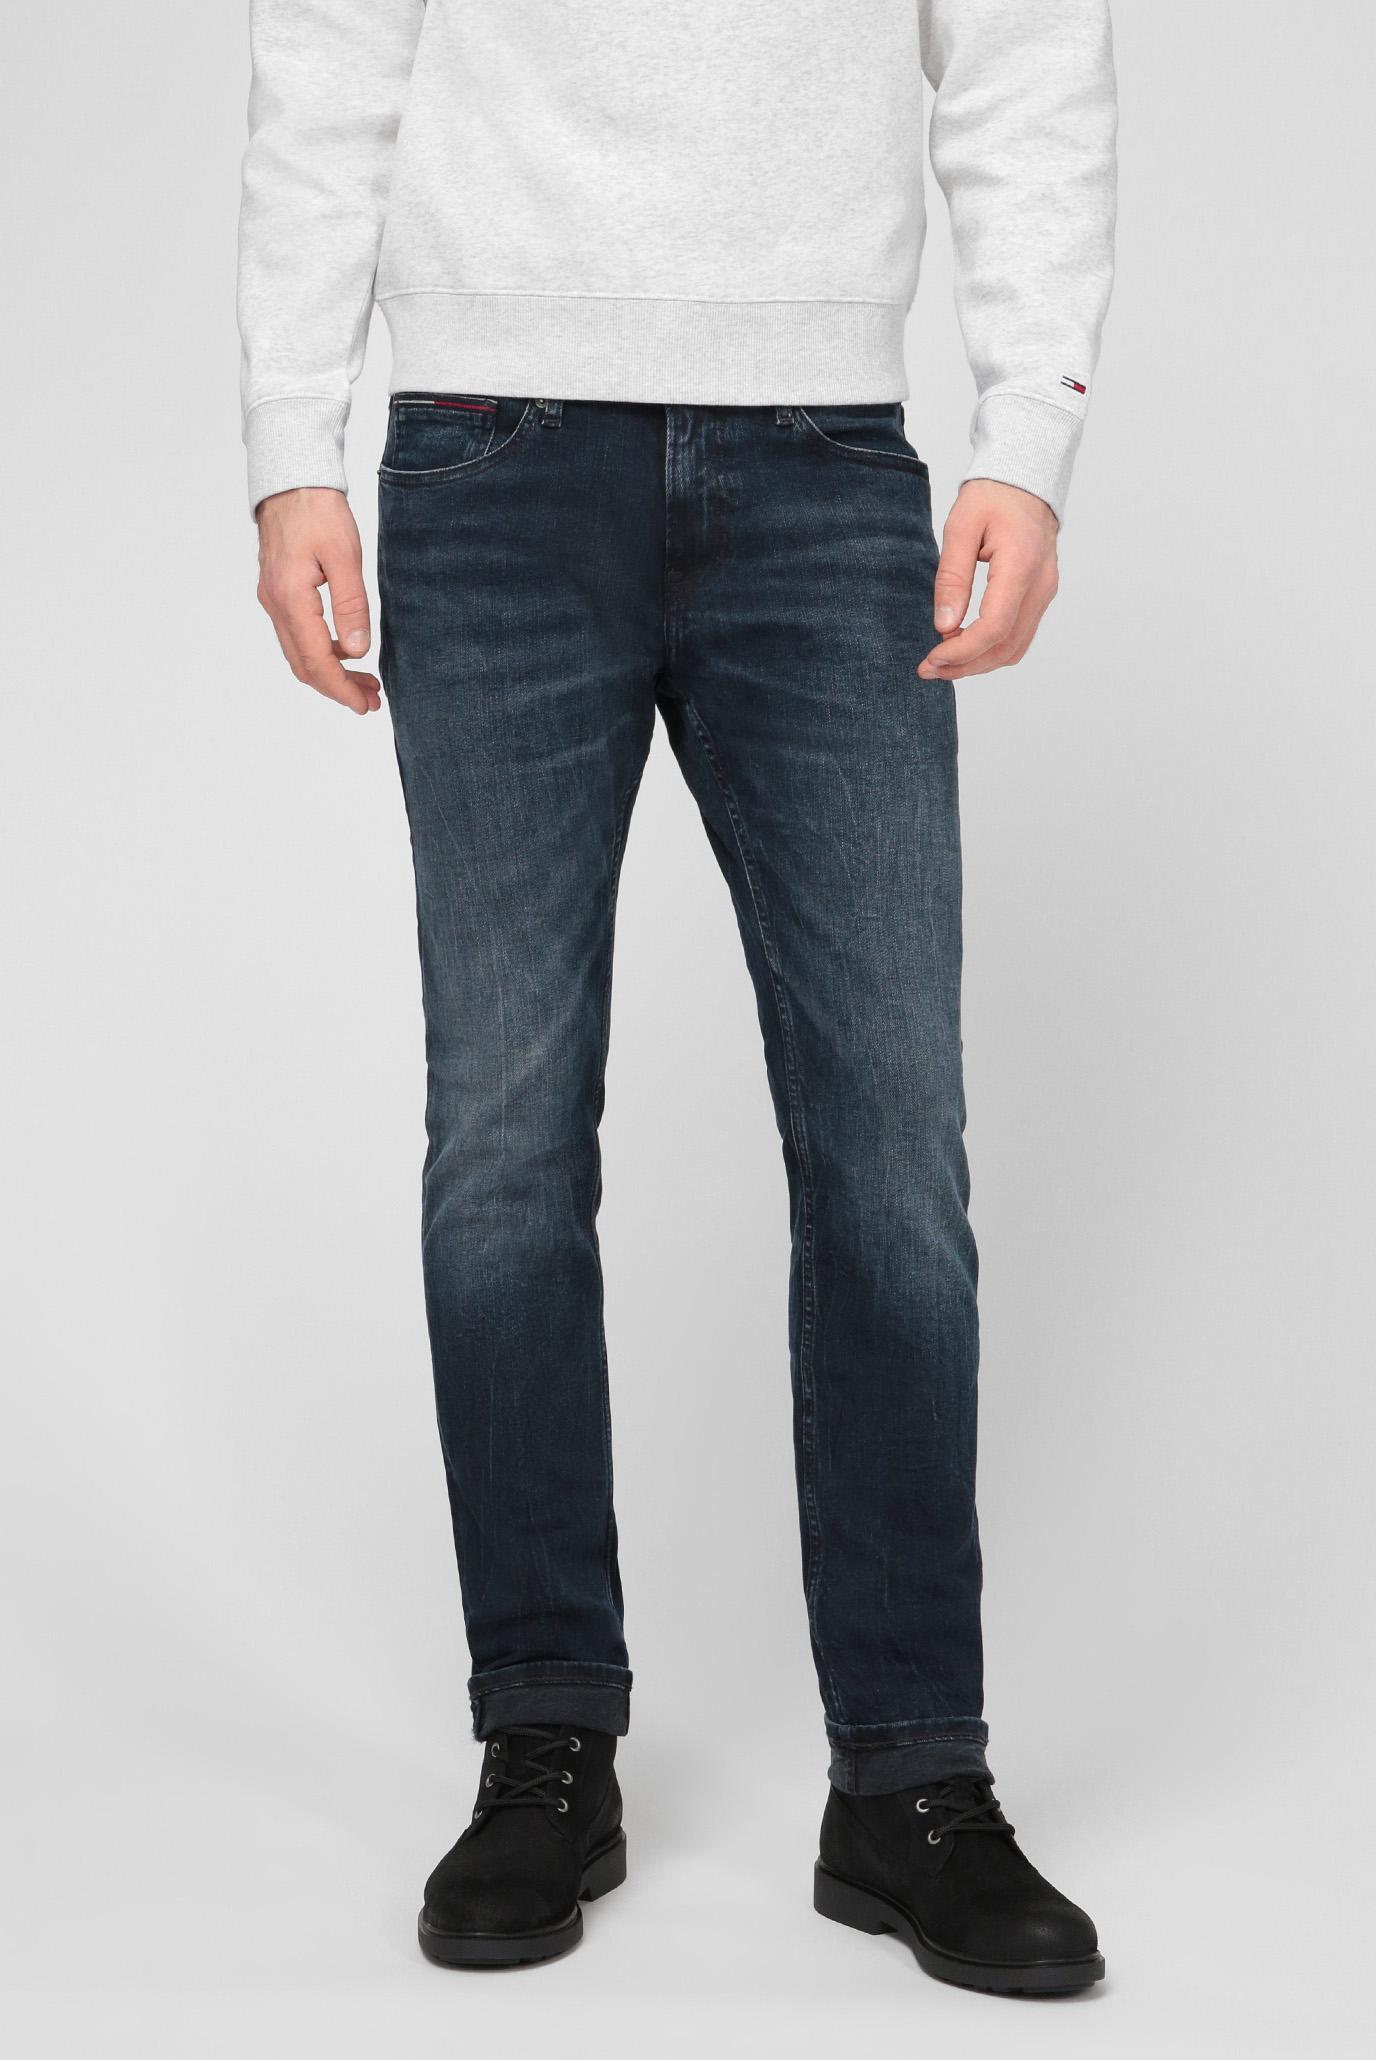 Мужские синие джинсы SCANTON SLIM MDBST Tommy Hilfiger DM0DM09296 — MD-Fashion